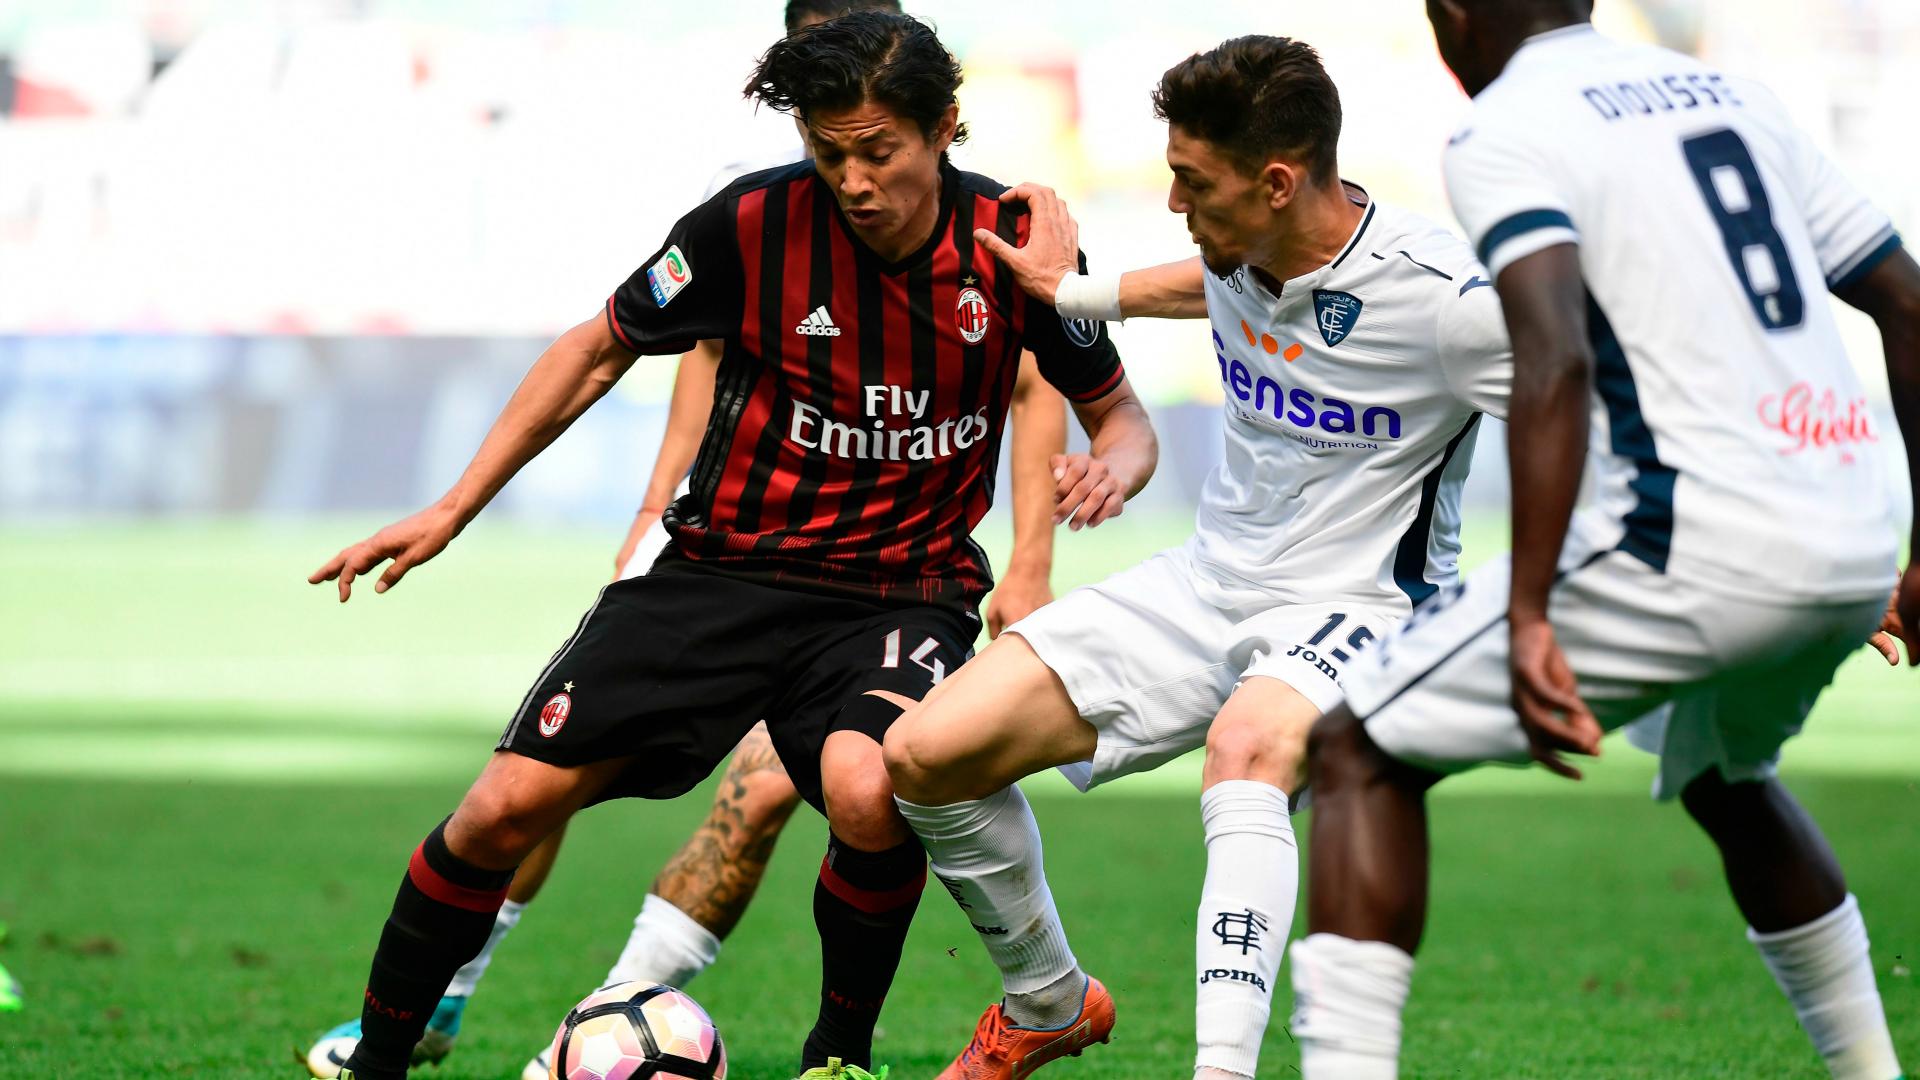 Milan-Empoli - Mati Fernandez